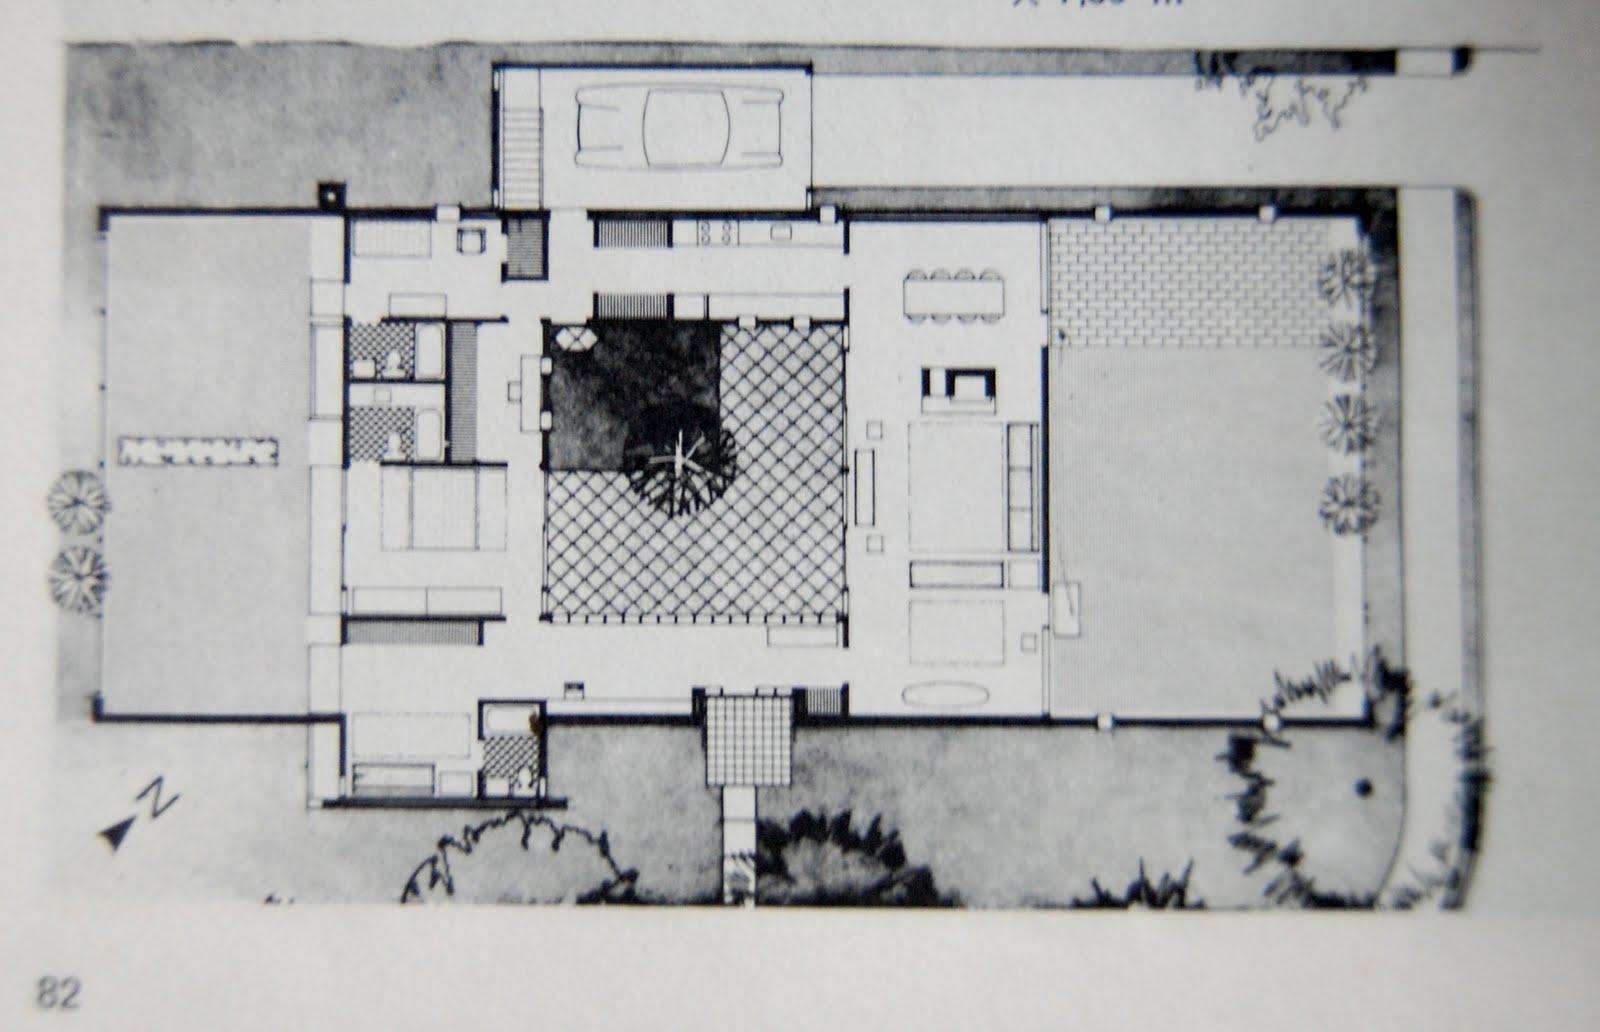 Arquitectura 1 agg casa sert en cambridge josep lluis - Agg arquitectura ...